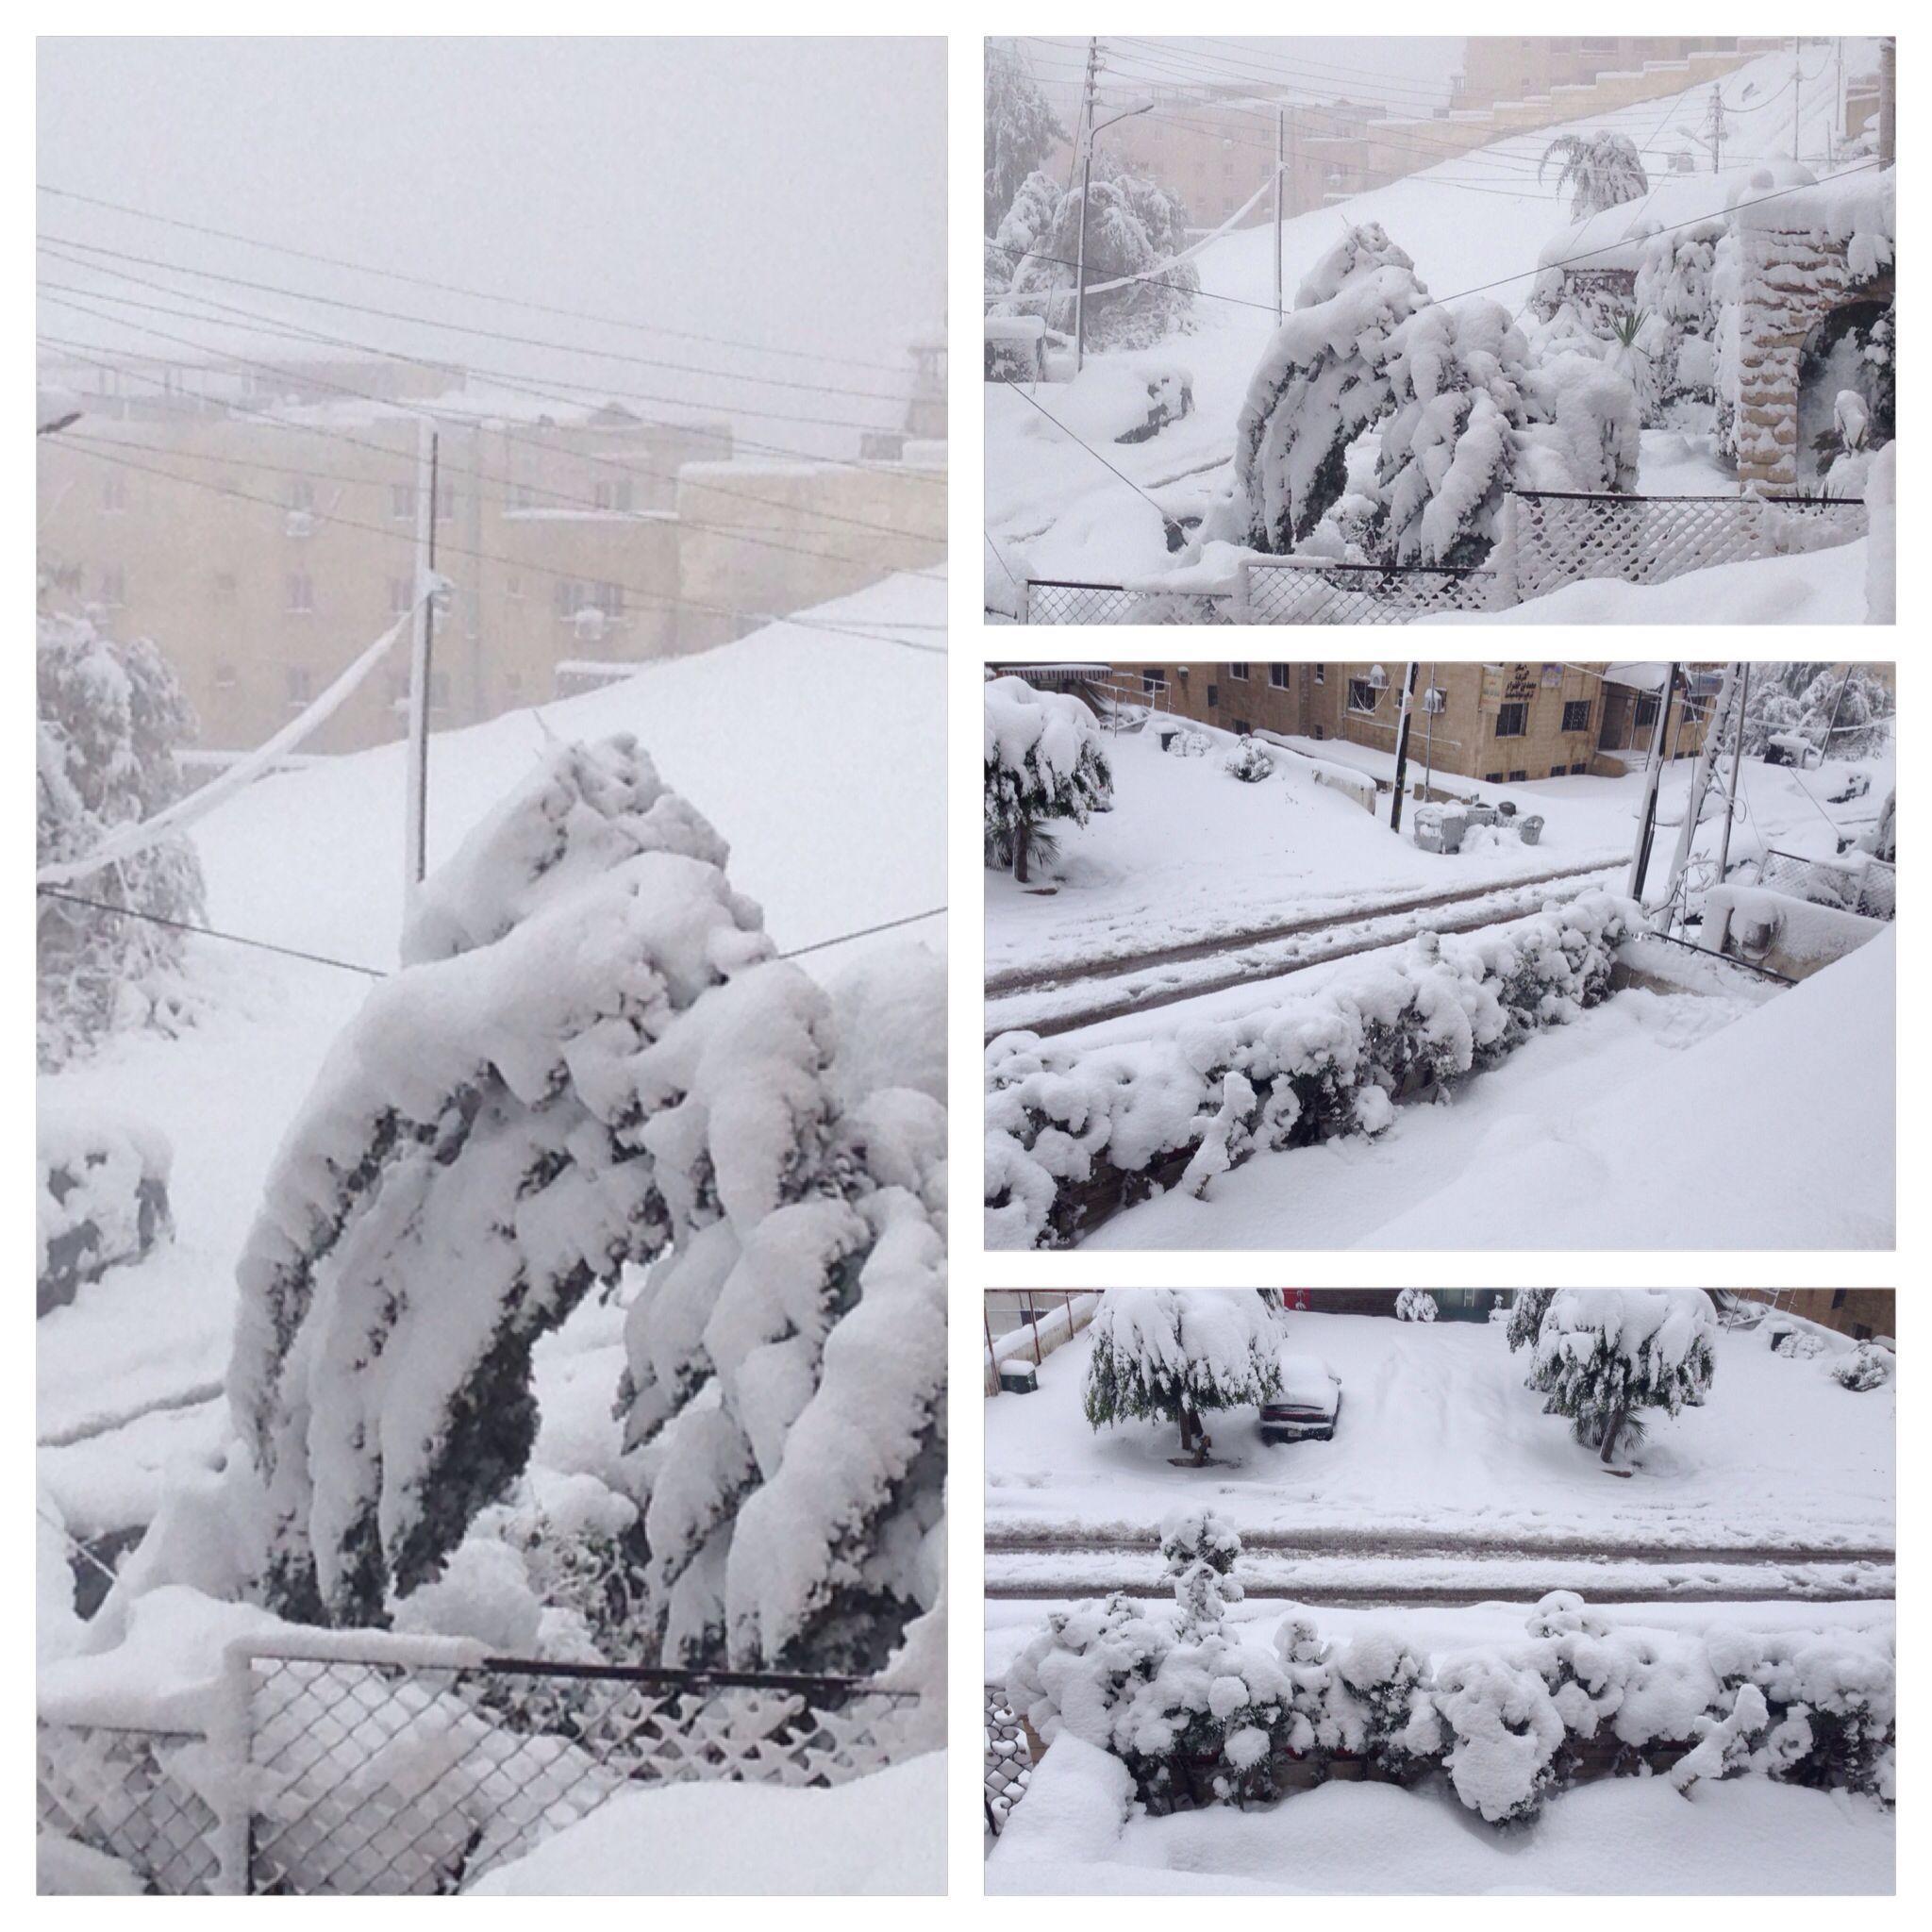 Snow in Amman Jordan #ammanjordan Snow in Amman Jordan #ammanjordan Snow in Amman Jordan #ammanjordan Snow in Amman Jordan #ammanjordan Snow in Amman Jordan #ammanjordan Snow in Amman Jordan #ammanjordan Snow in Amman Jordan #ammanjordan Snow in Amman Jordan #ammanjordan Snow in Amman Jordan #ammanjordan Snow in Amman Jordan #ammanjordan Snow in Amman Jordan #ammanjordan Snow in Amman Jordan #ammanjordan Snow in Amman Jordan #ammanjordan Snow in Amman Jordan #ammanjordan Snow in Amman Jordan #am #ammanjordan